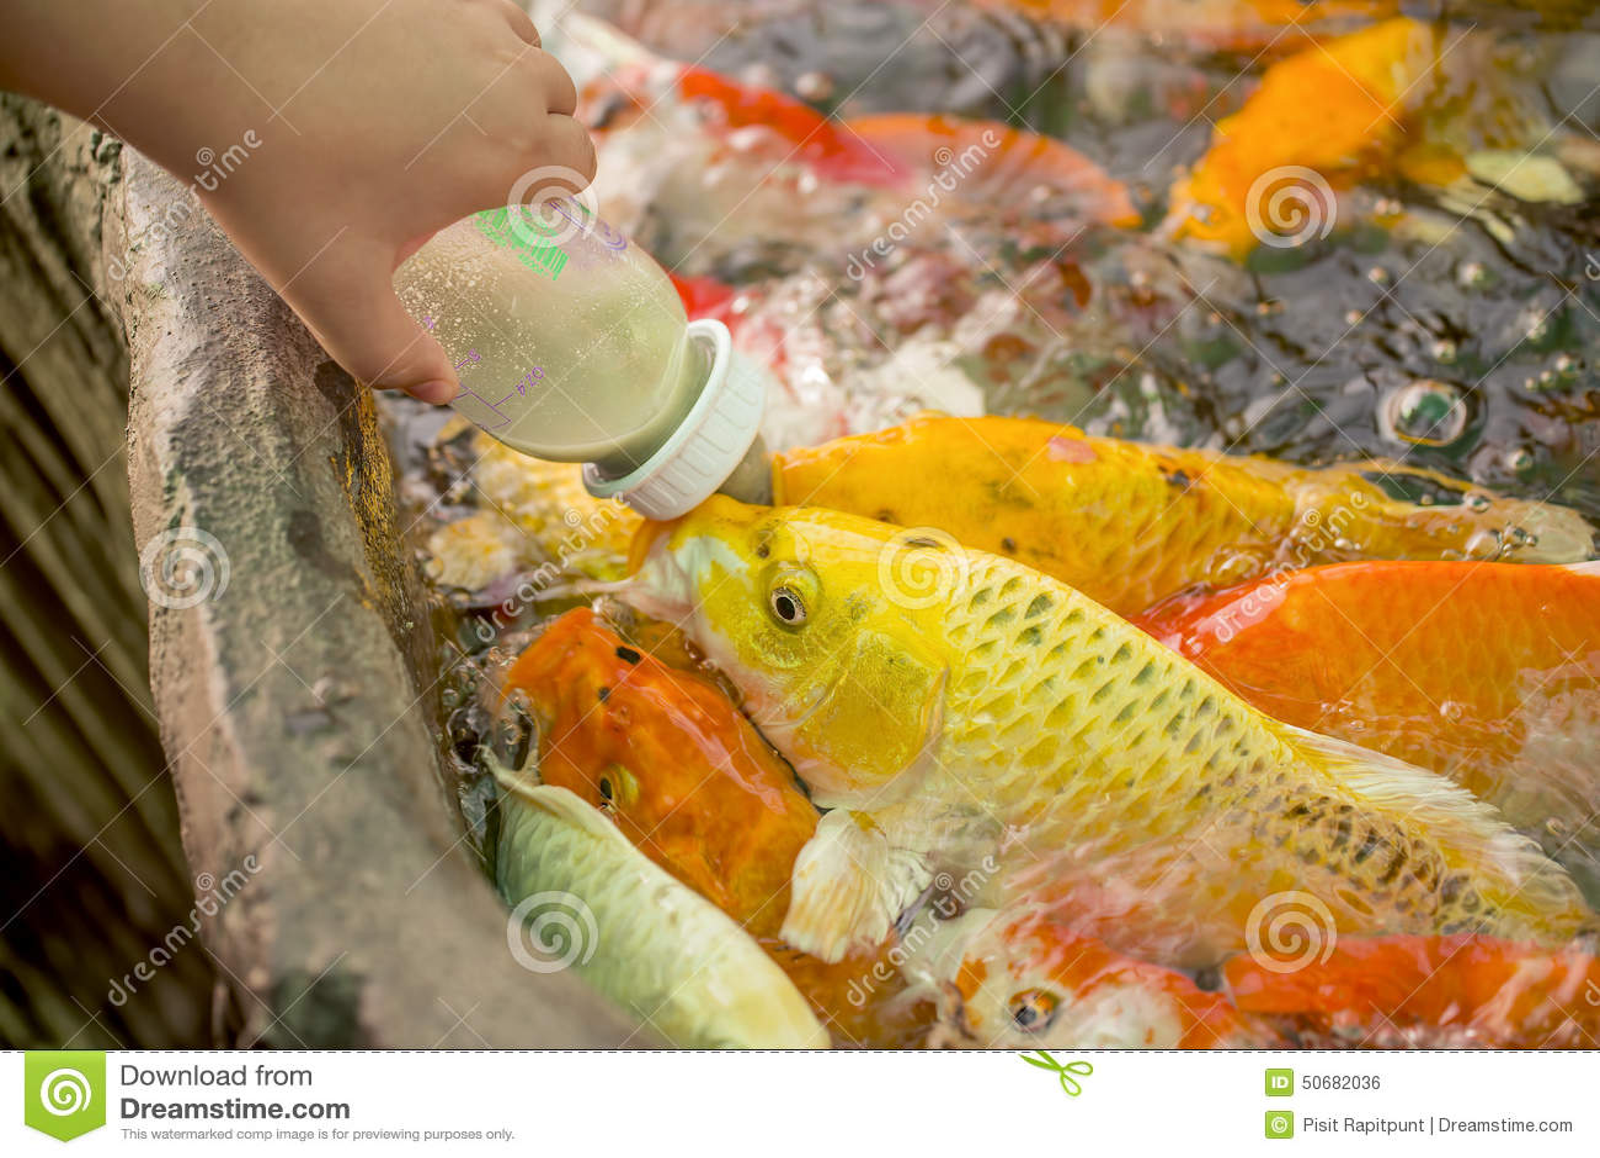 Download 哺养的饥饿的花梢鲤鱼在水池钓鱼 库存照片. 图片 包括有 五颜六色, 橙色, 许多, 生活, 提供, 的treadled - 50682036